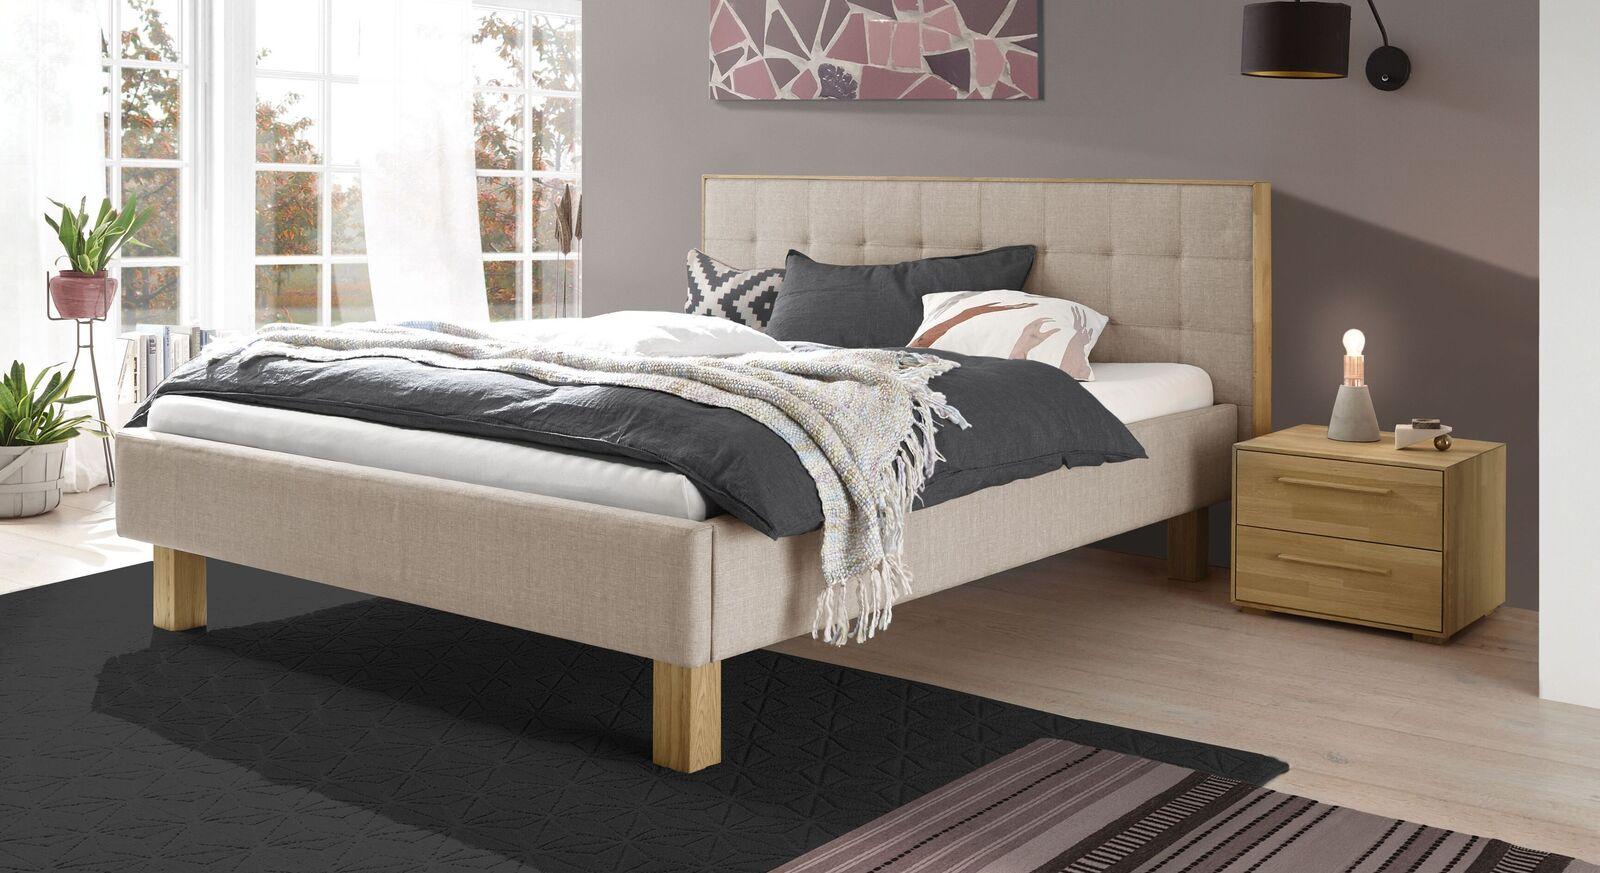 Bett Kadira aus beigefarbenem Webstoff